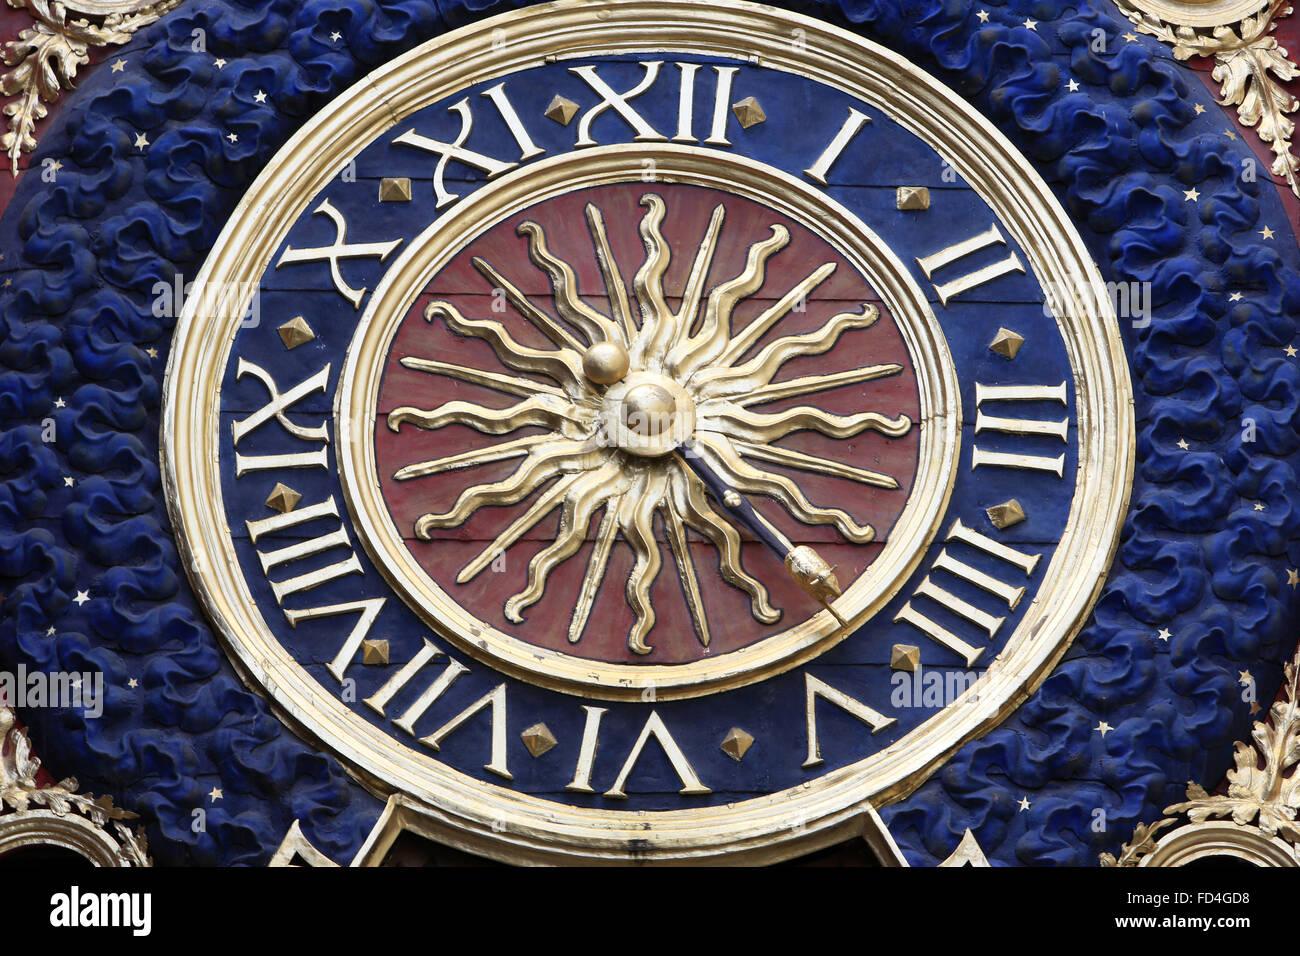 Gros Horloge, a fourteenth-century astronomical clock in Rouen. - Stock Image